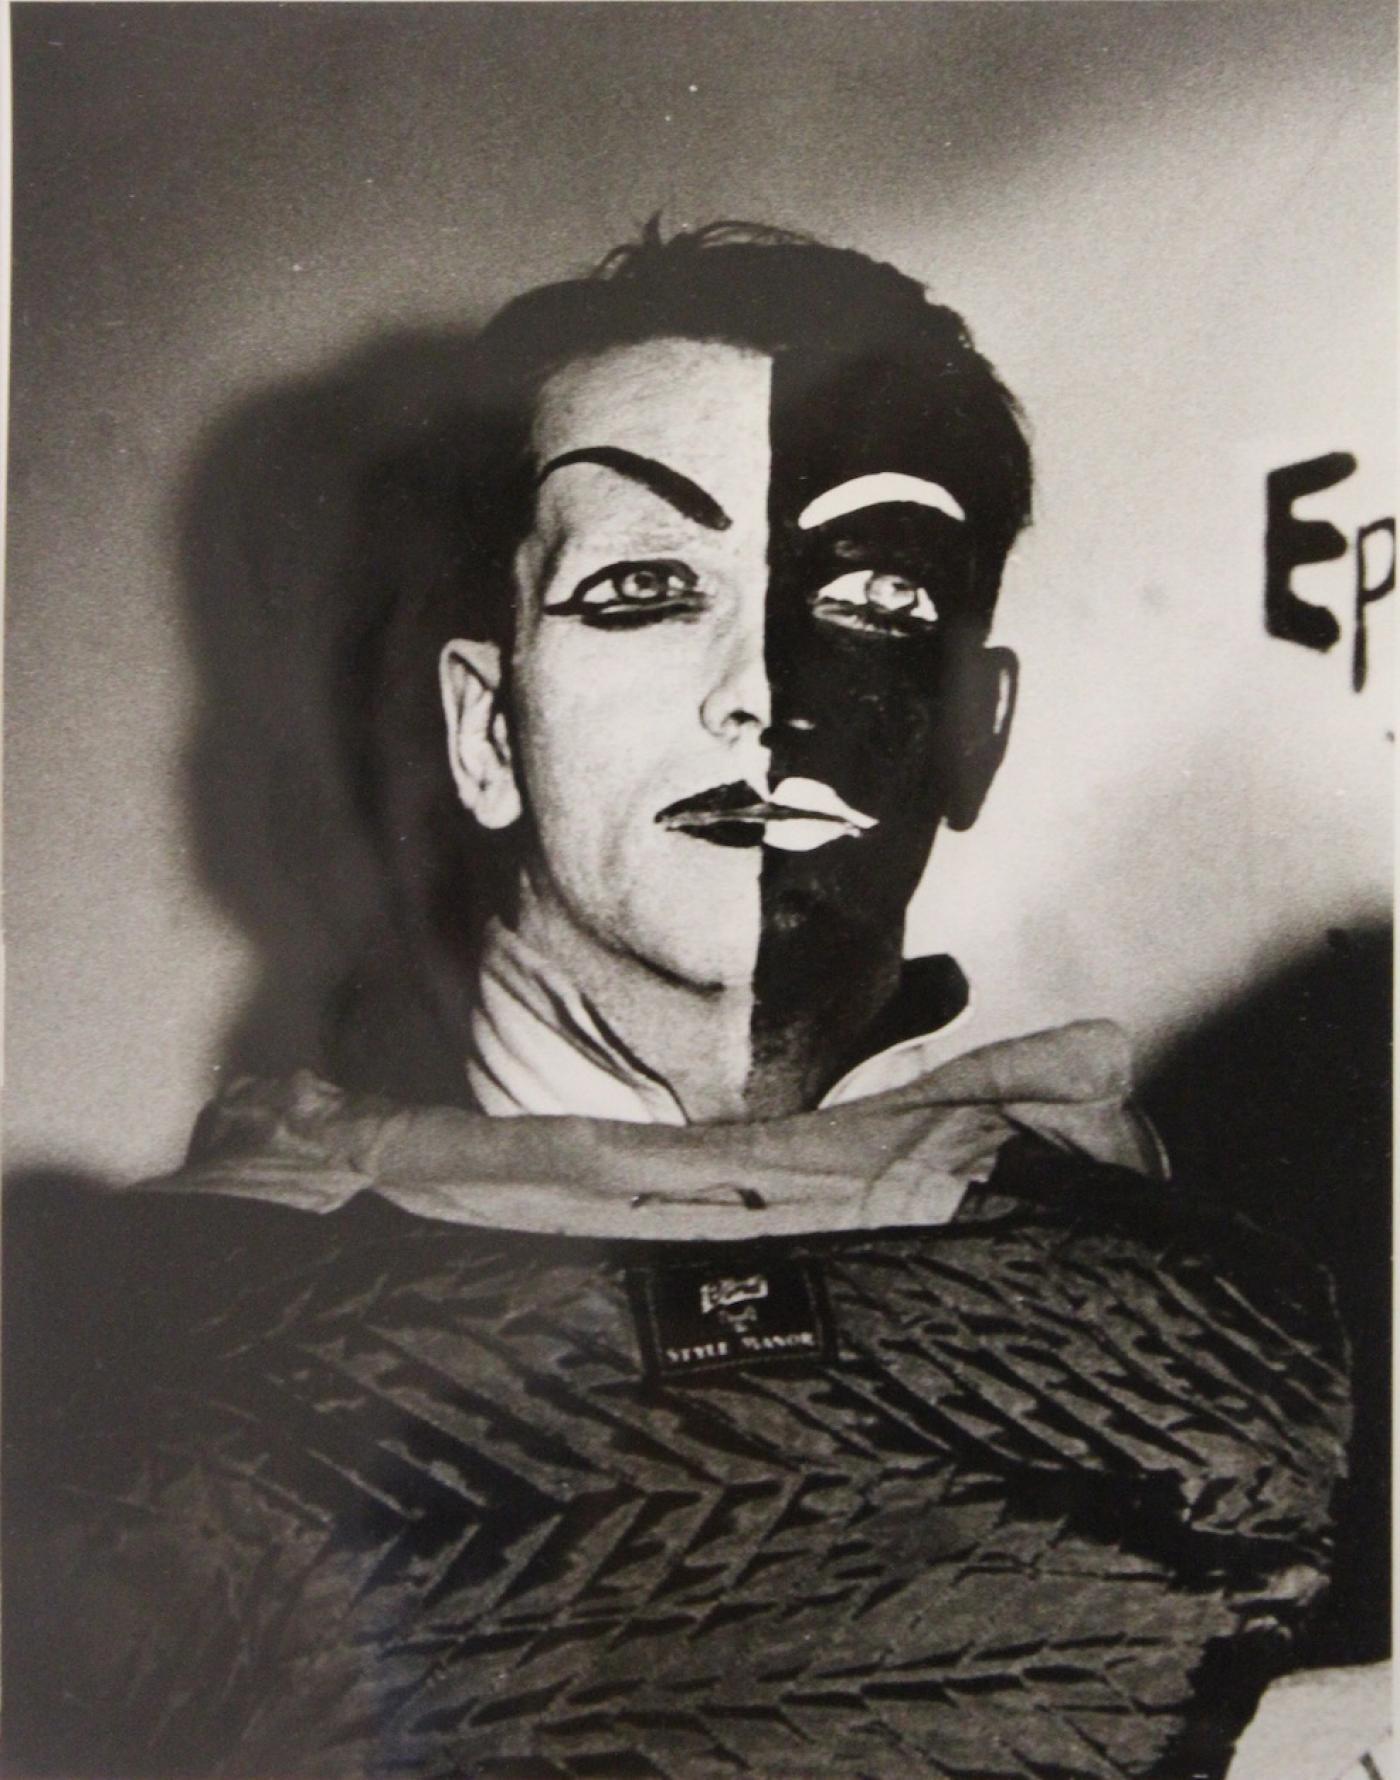 Weegee Arthur Fellig Weegee Harliquin Portrait Photograph